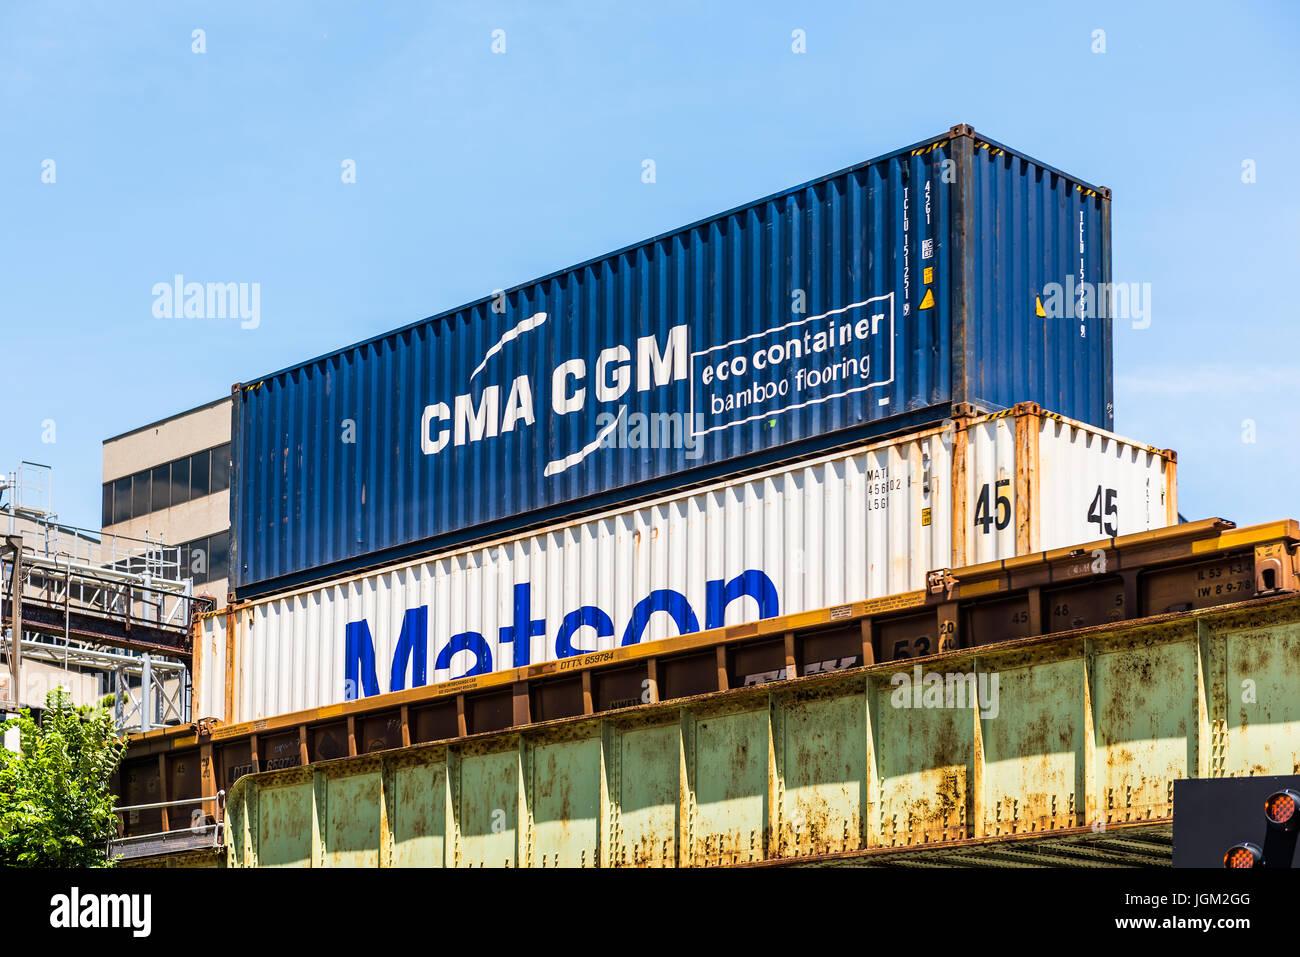 Washington DC, USA - July 3, 2017: CMA CGM Matson eco bamboo cargo shipping container on train - Stock Image